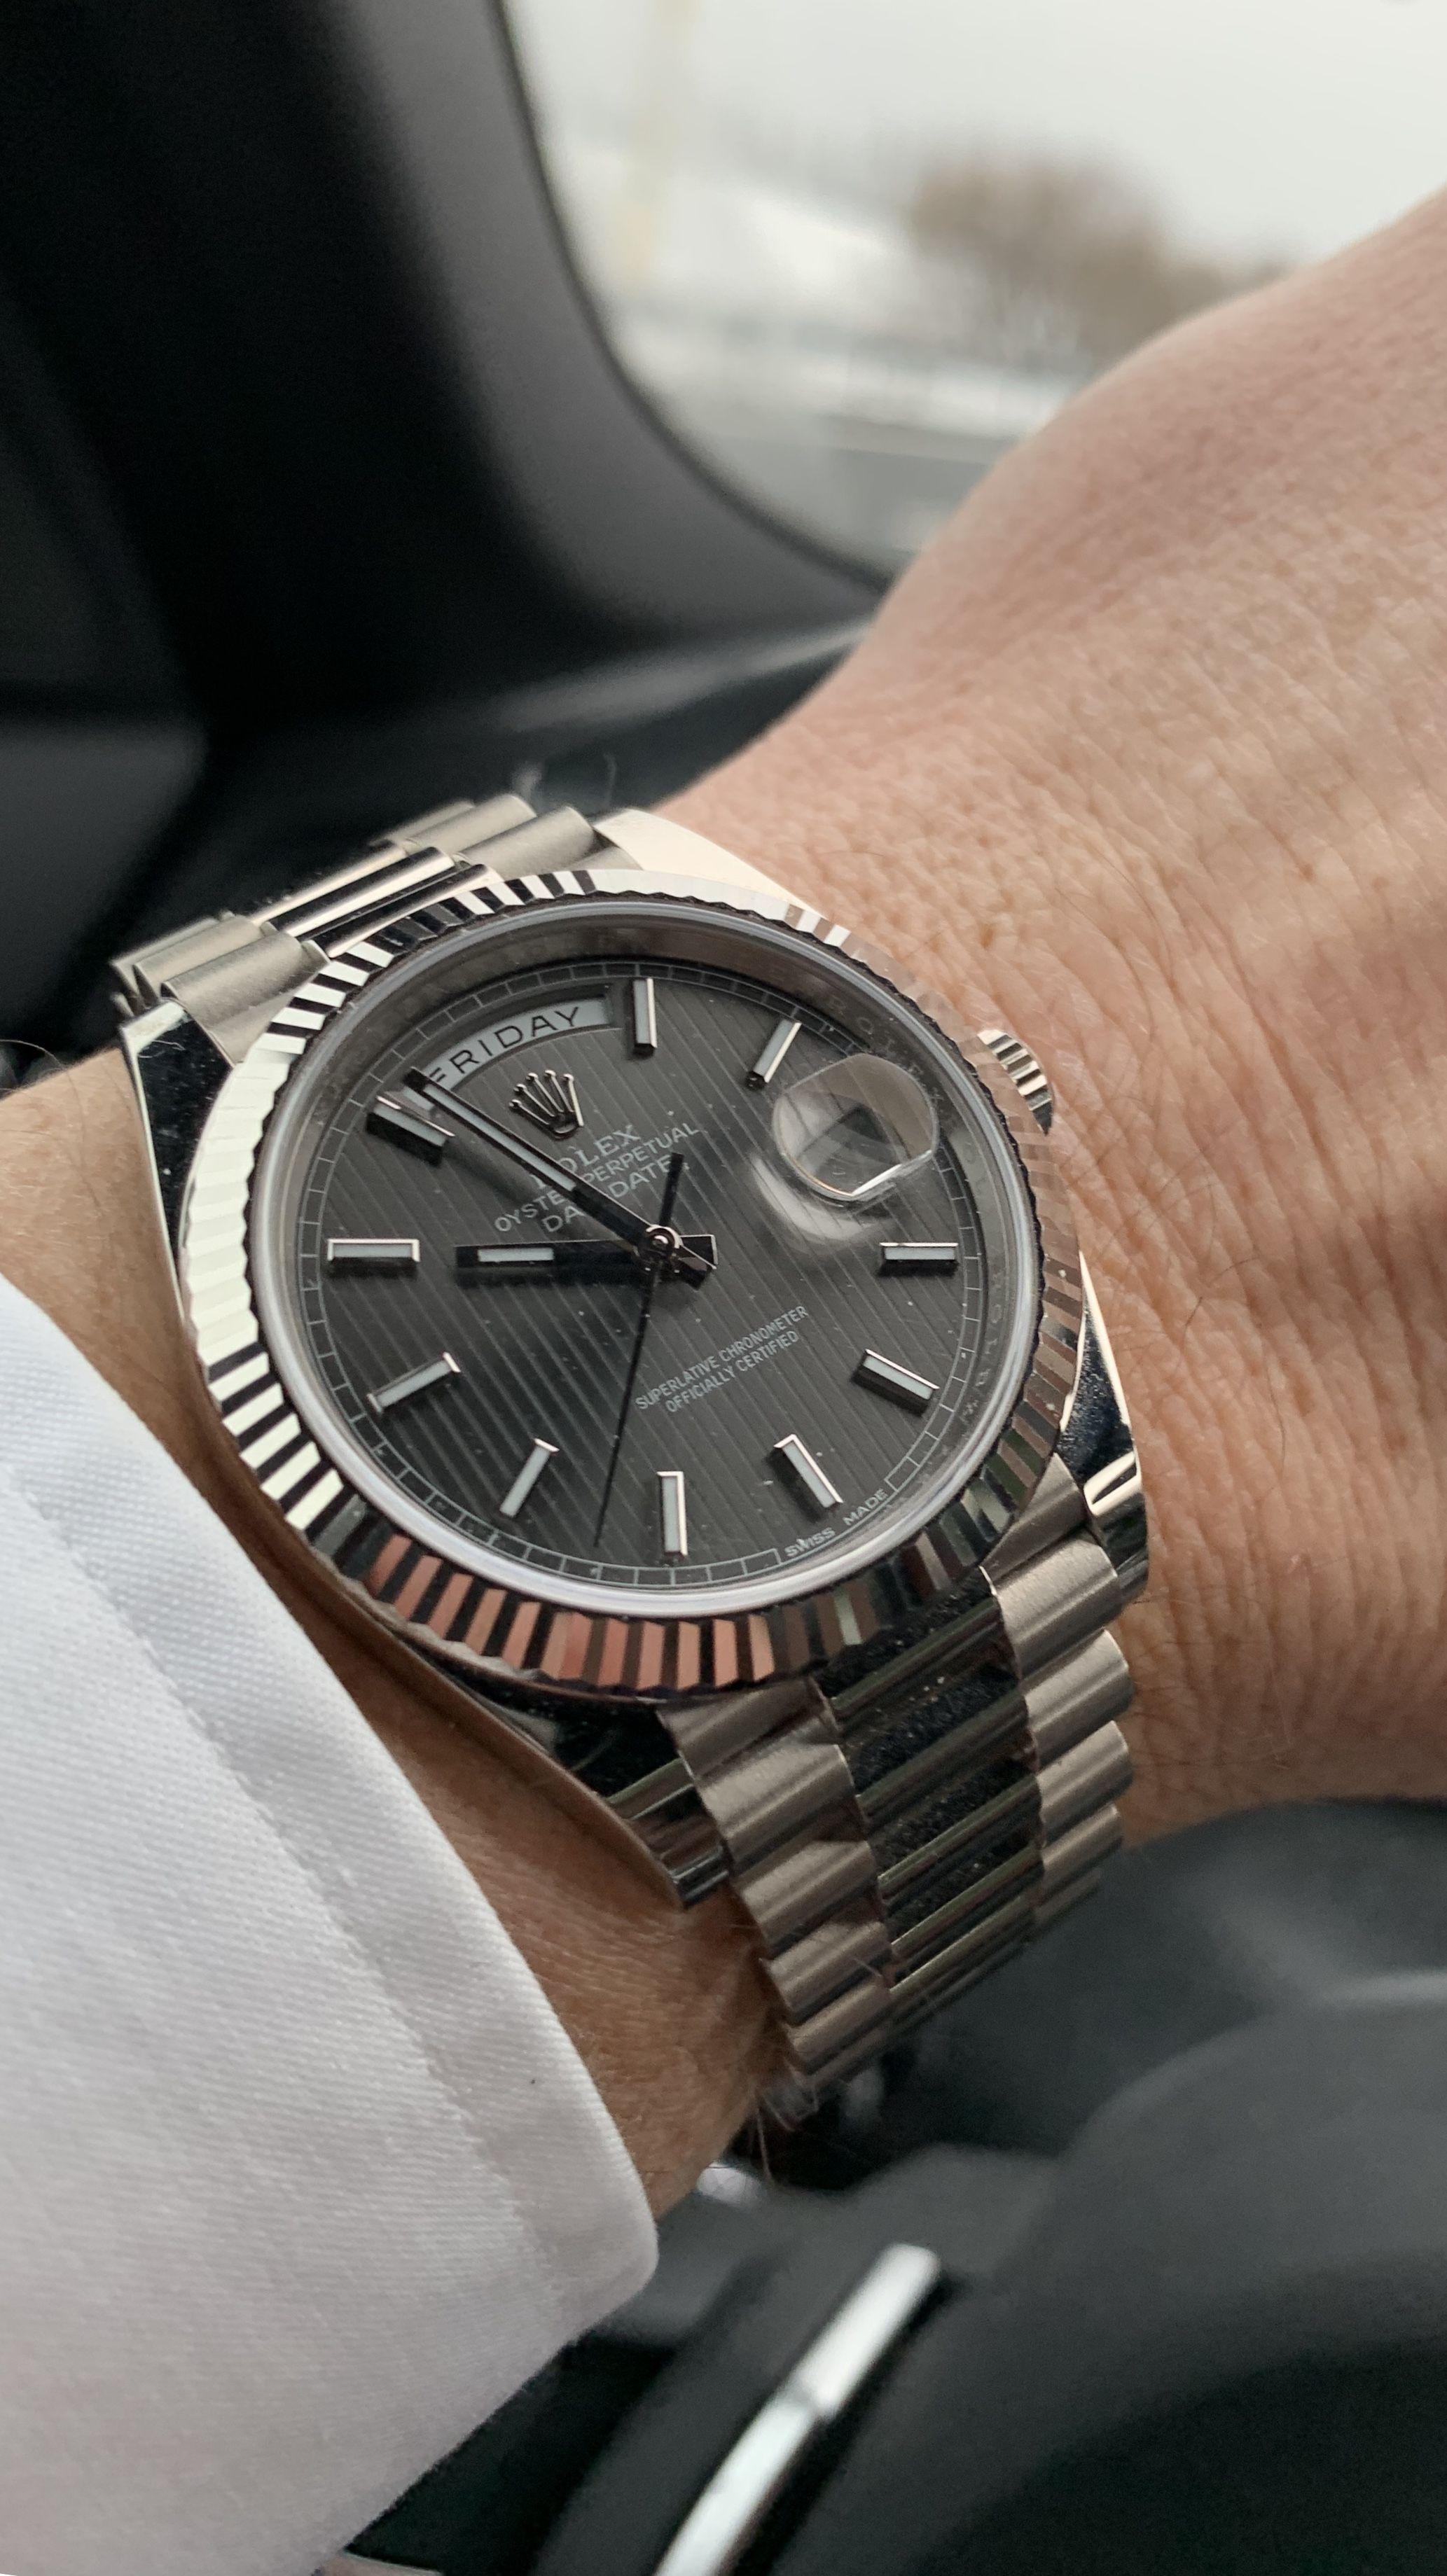 The perfect Rolex. Beautiful, Classic, Distinguished